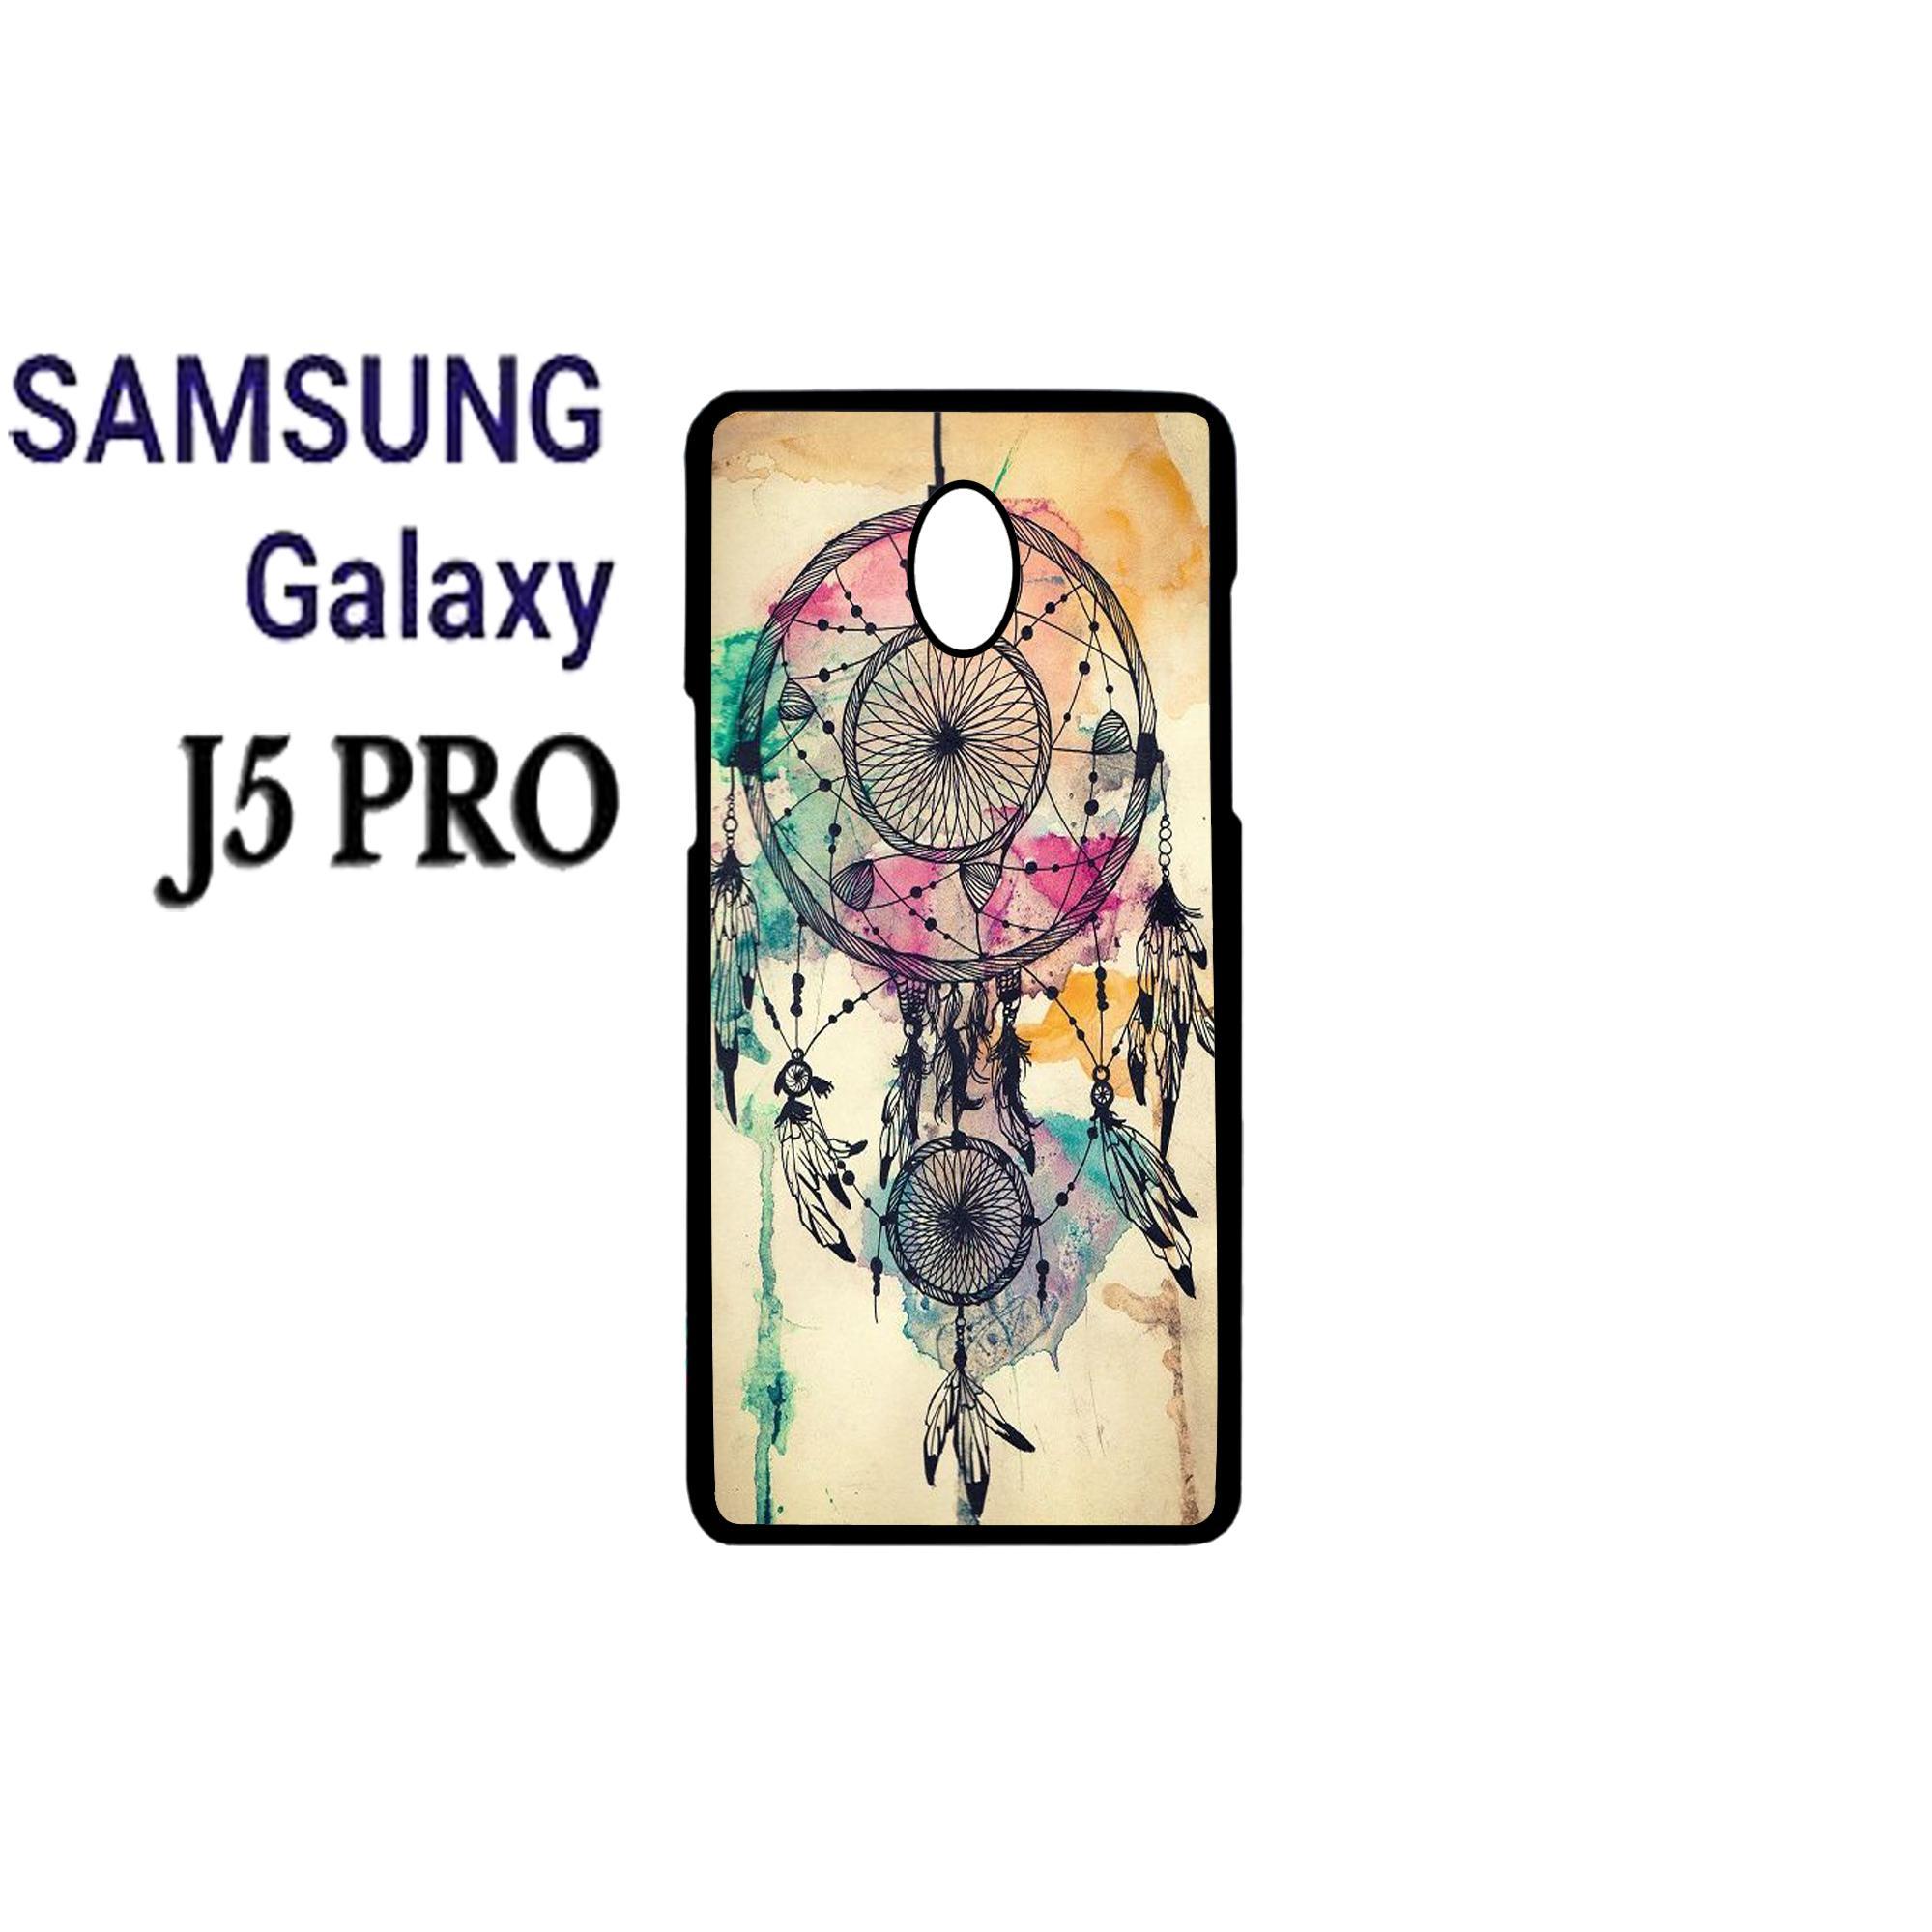 Rajamurah fasion printing case Samsung Galaxy J5pro - 21